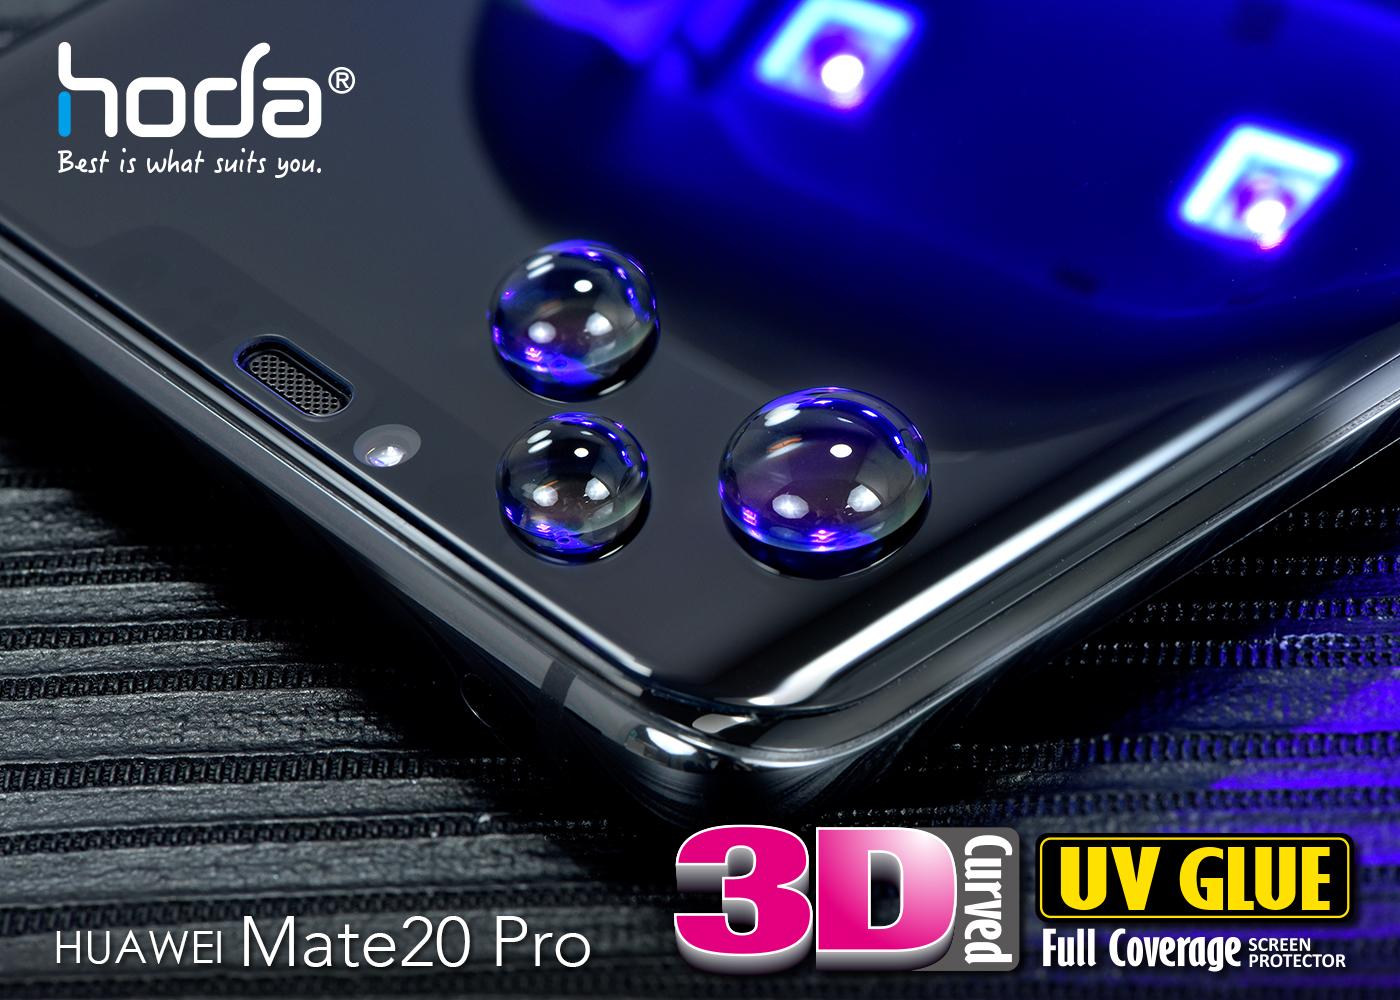 Huawei Mate20 Pro 3D UV Full Glue Curved Glass Protector   hoda®